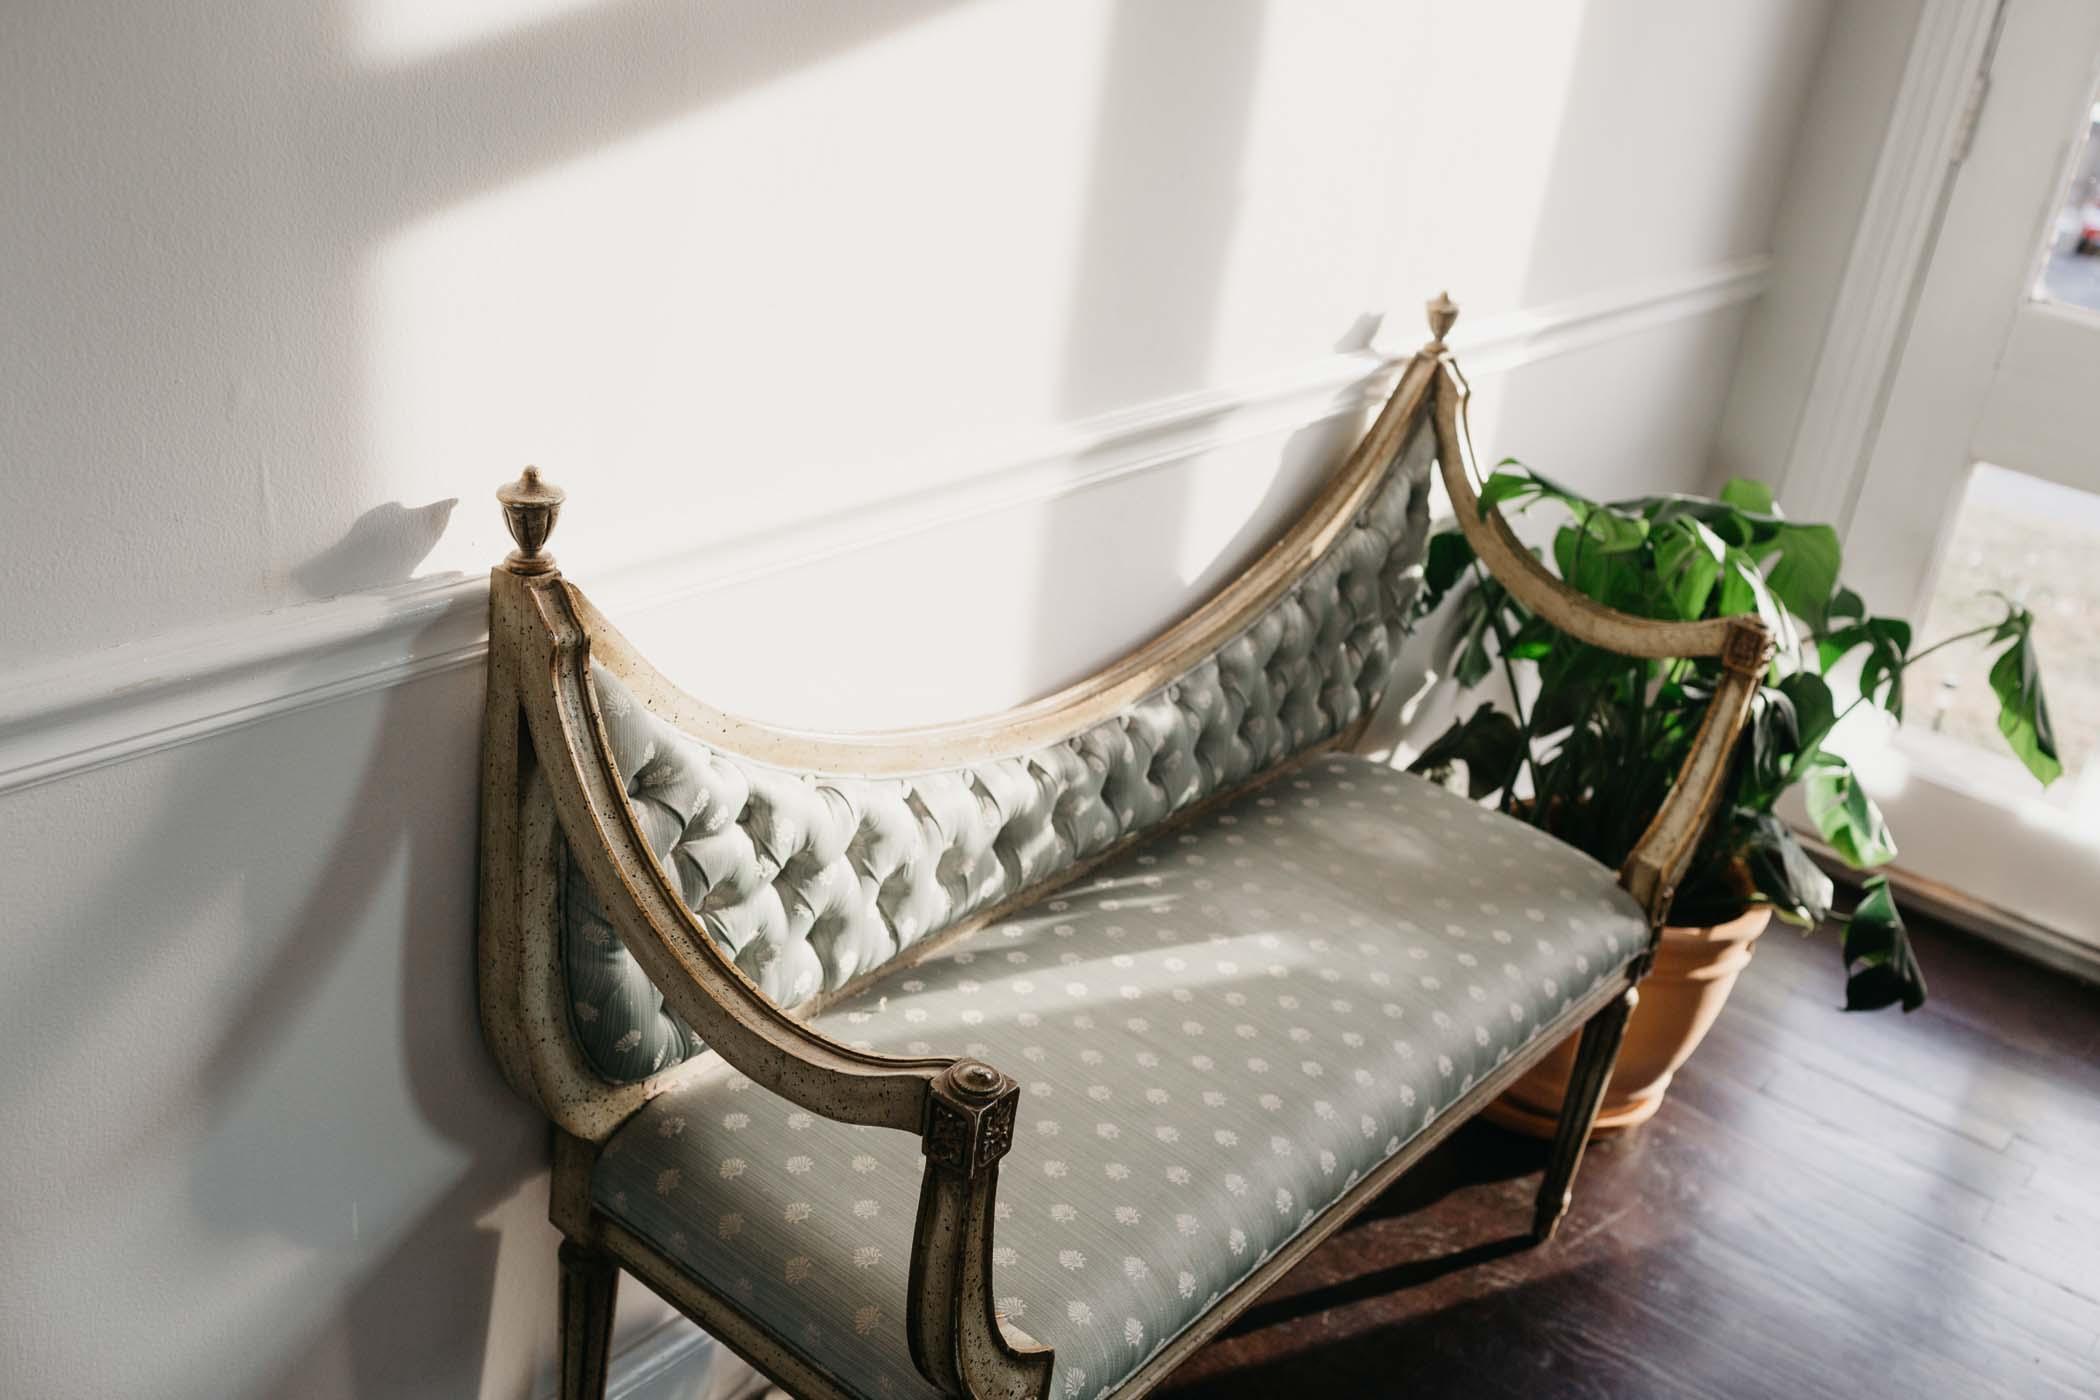 cozy-casa-nashville-tn-natural-light-studio-photography-ideas-lifestyle-photographer-photography-17.jpg